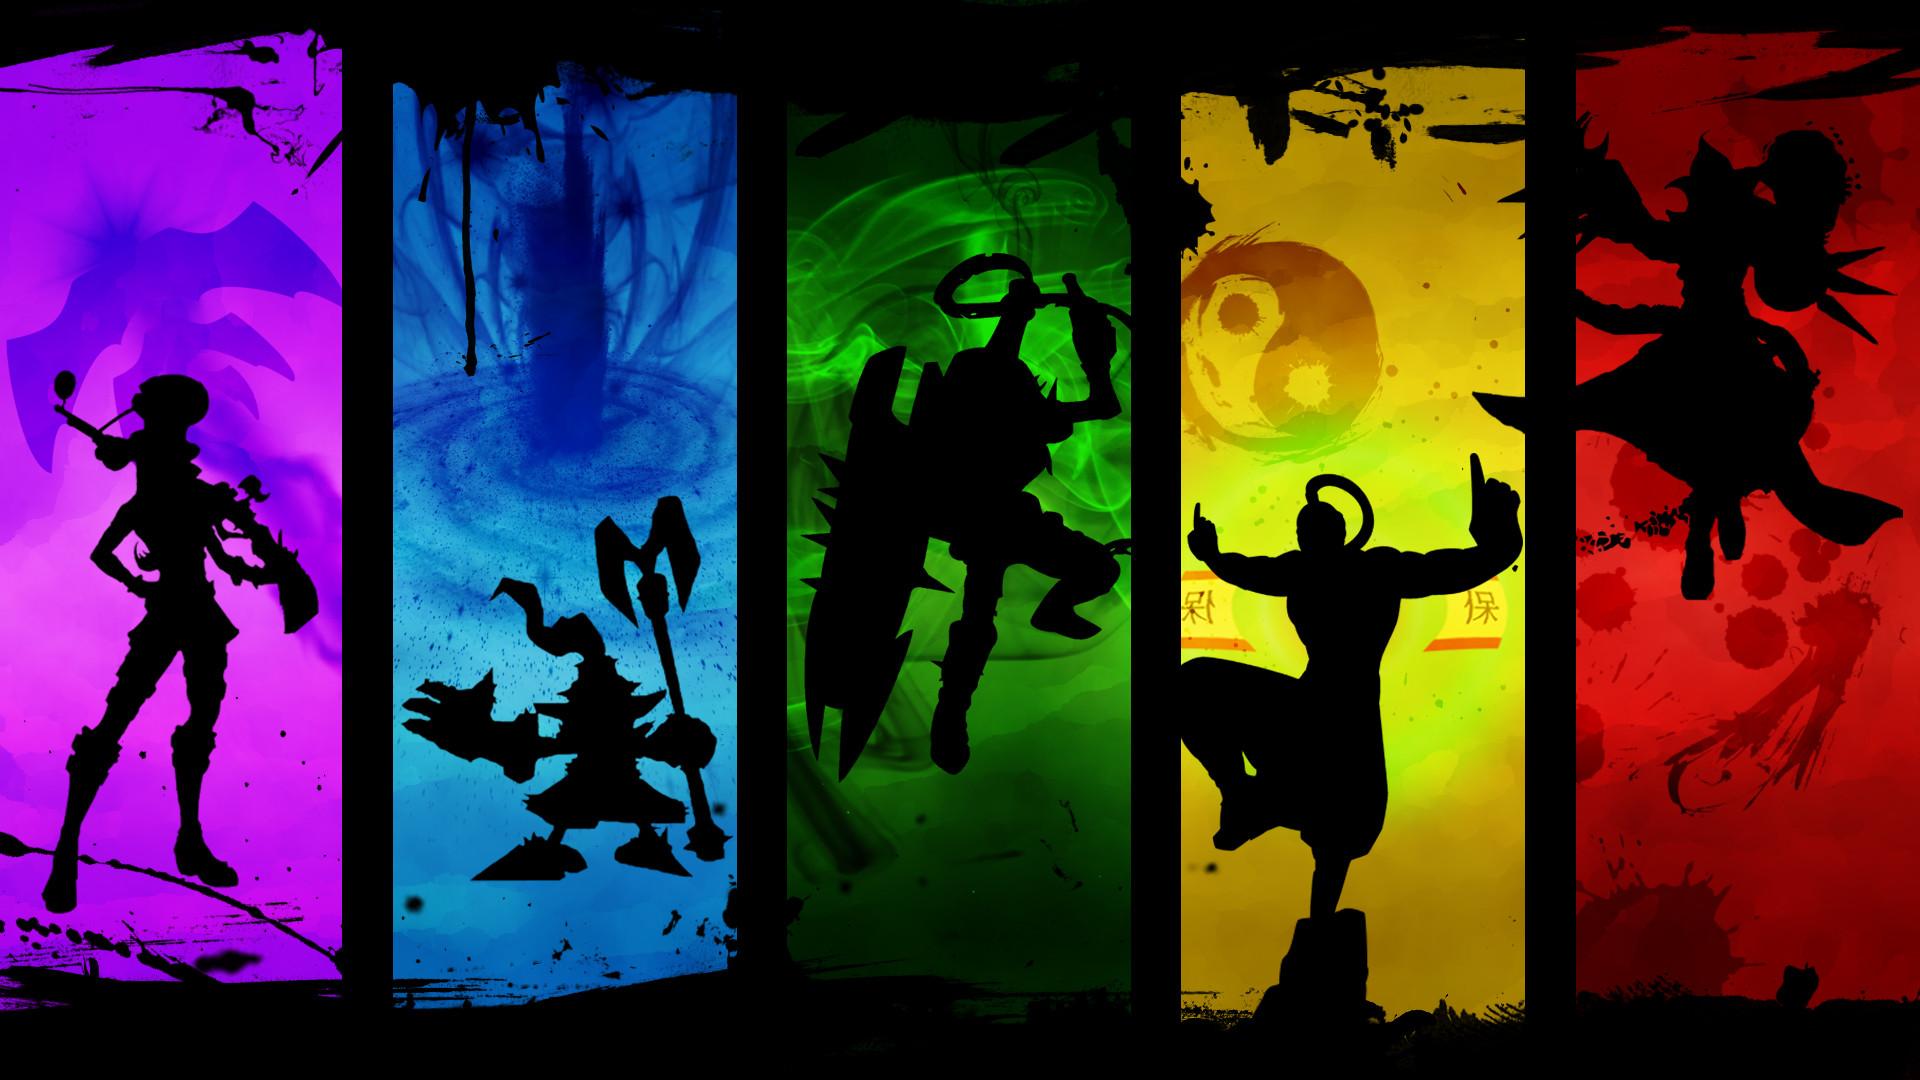 League of Legends Wallpaper Full HD free Download